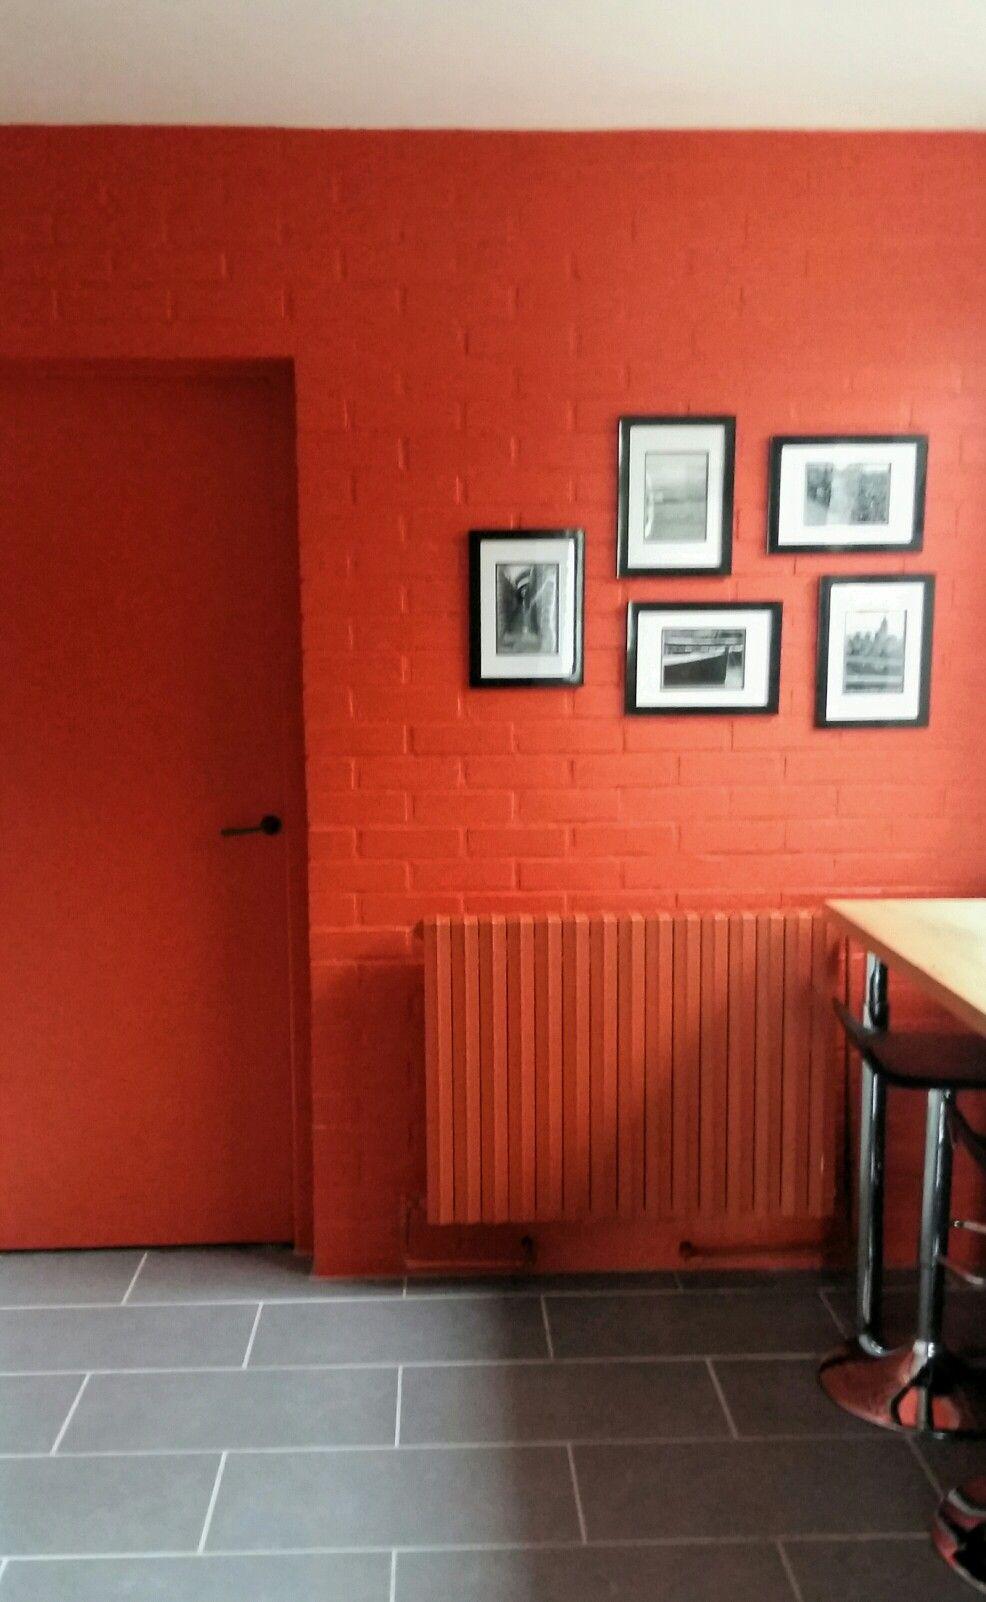 Pep S Dans La Cuisine Painted Brick Walls Painted Brick Wall